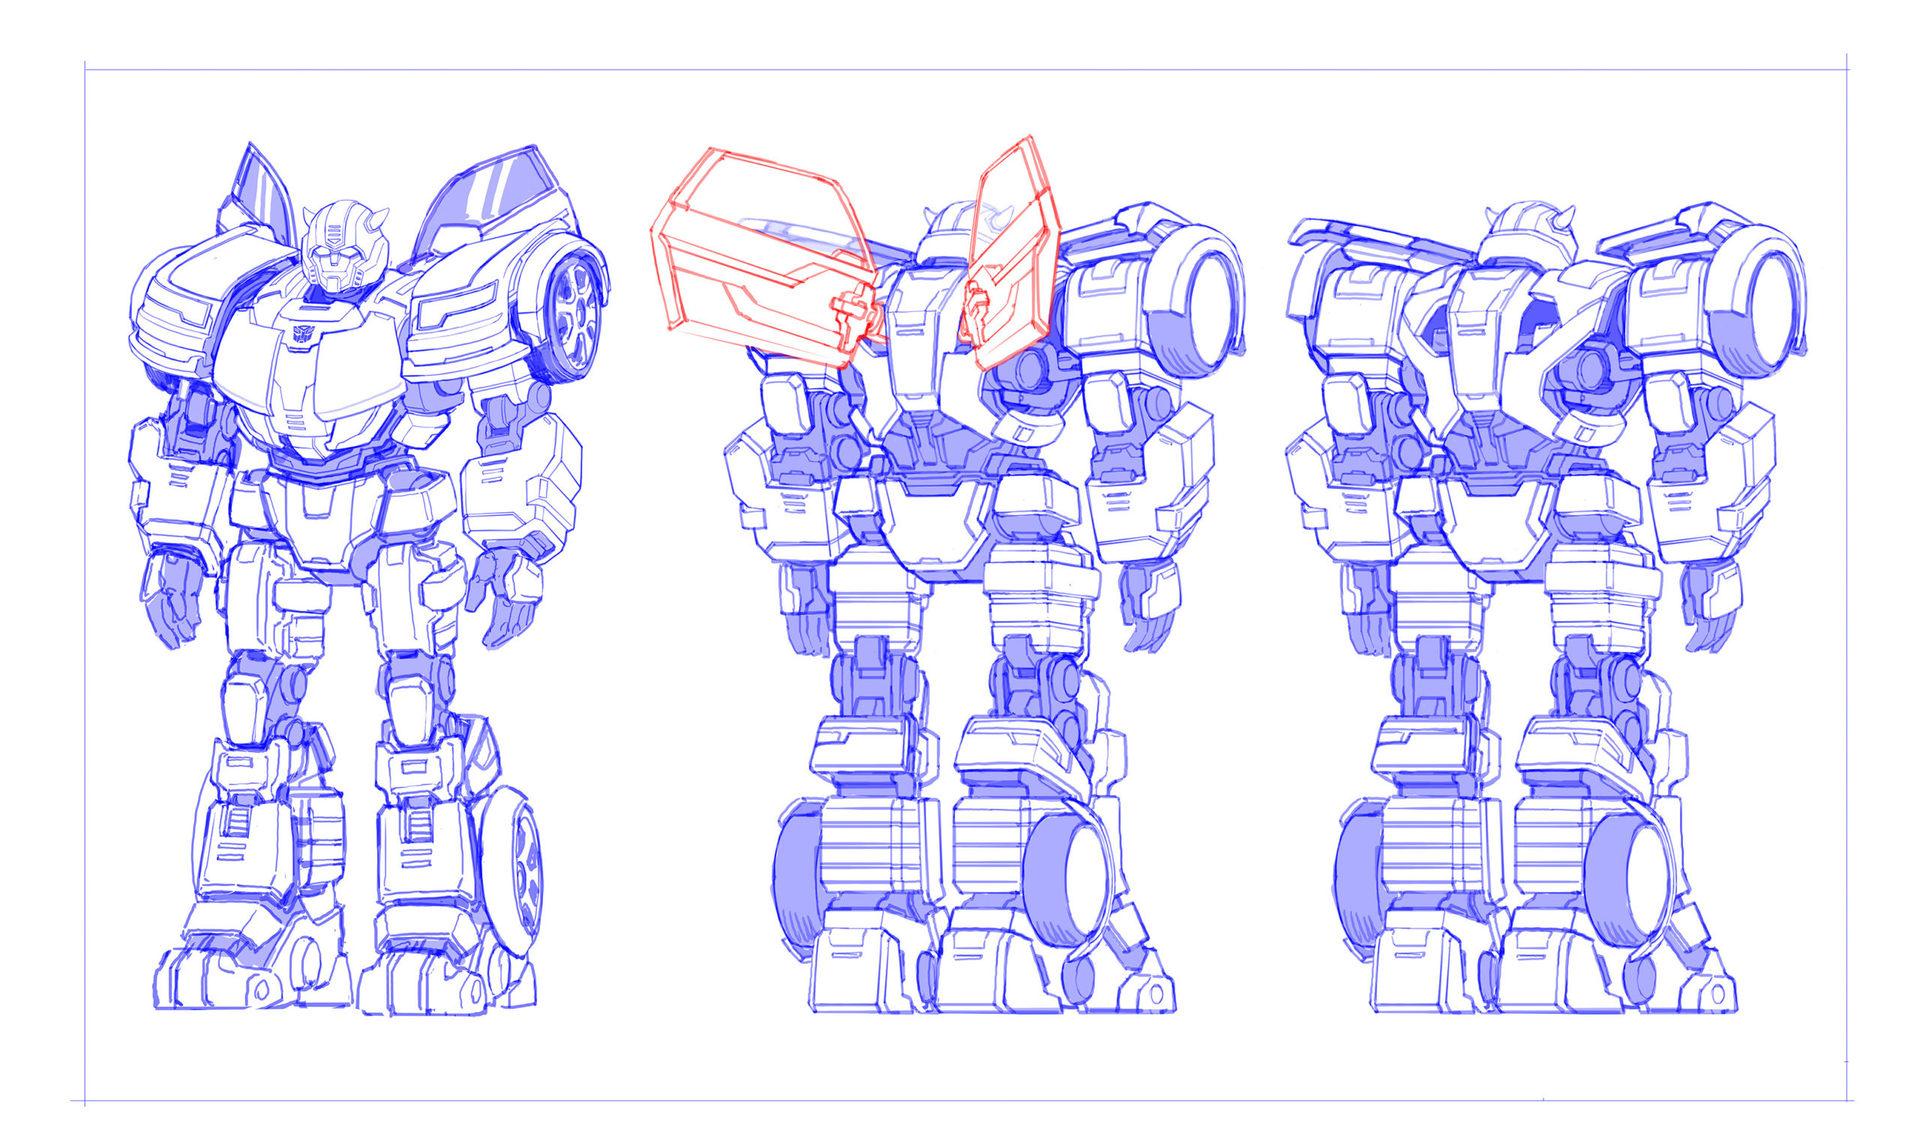 Transformers Heavy Metal Bumblebee Concept